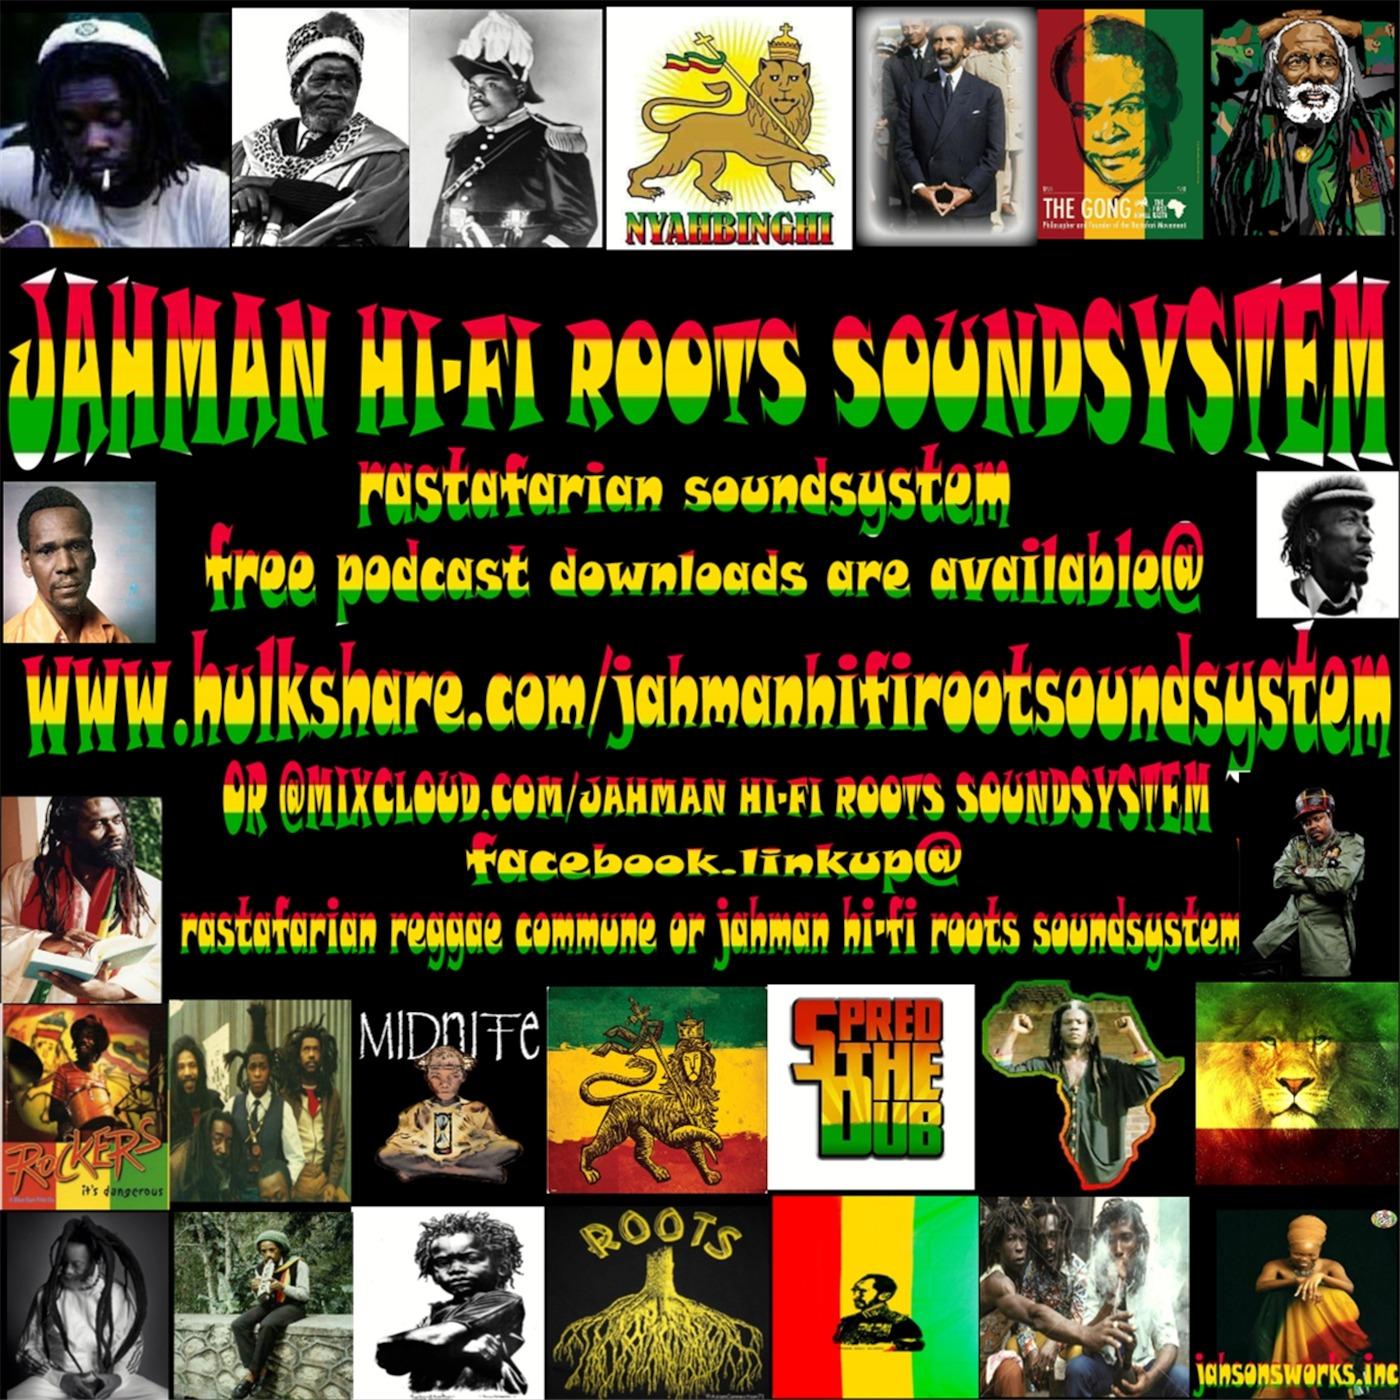 JAHMAN HI-FI ROOTS SOUNDSYSTEM (rastafarian soundsystem )